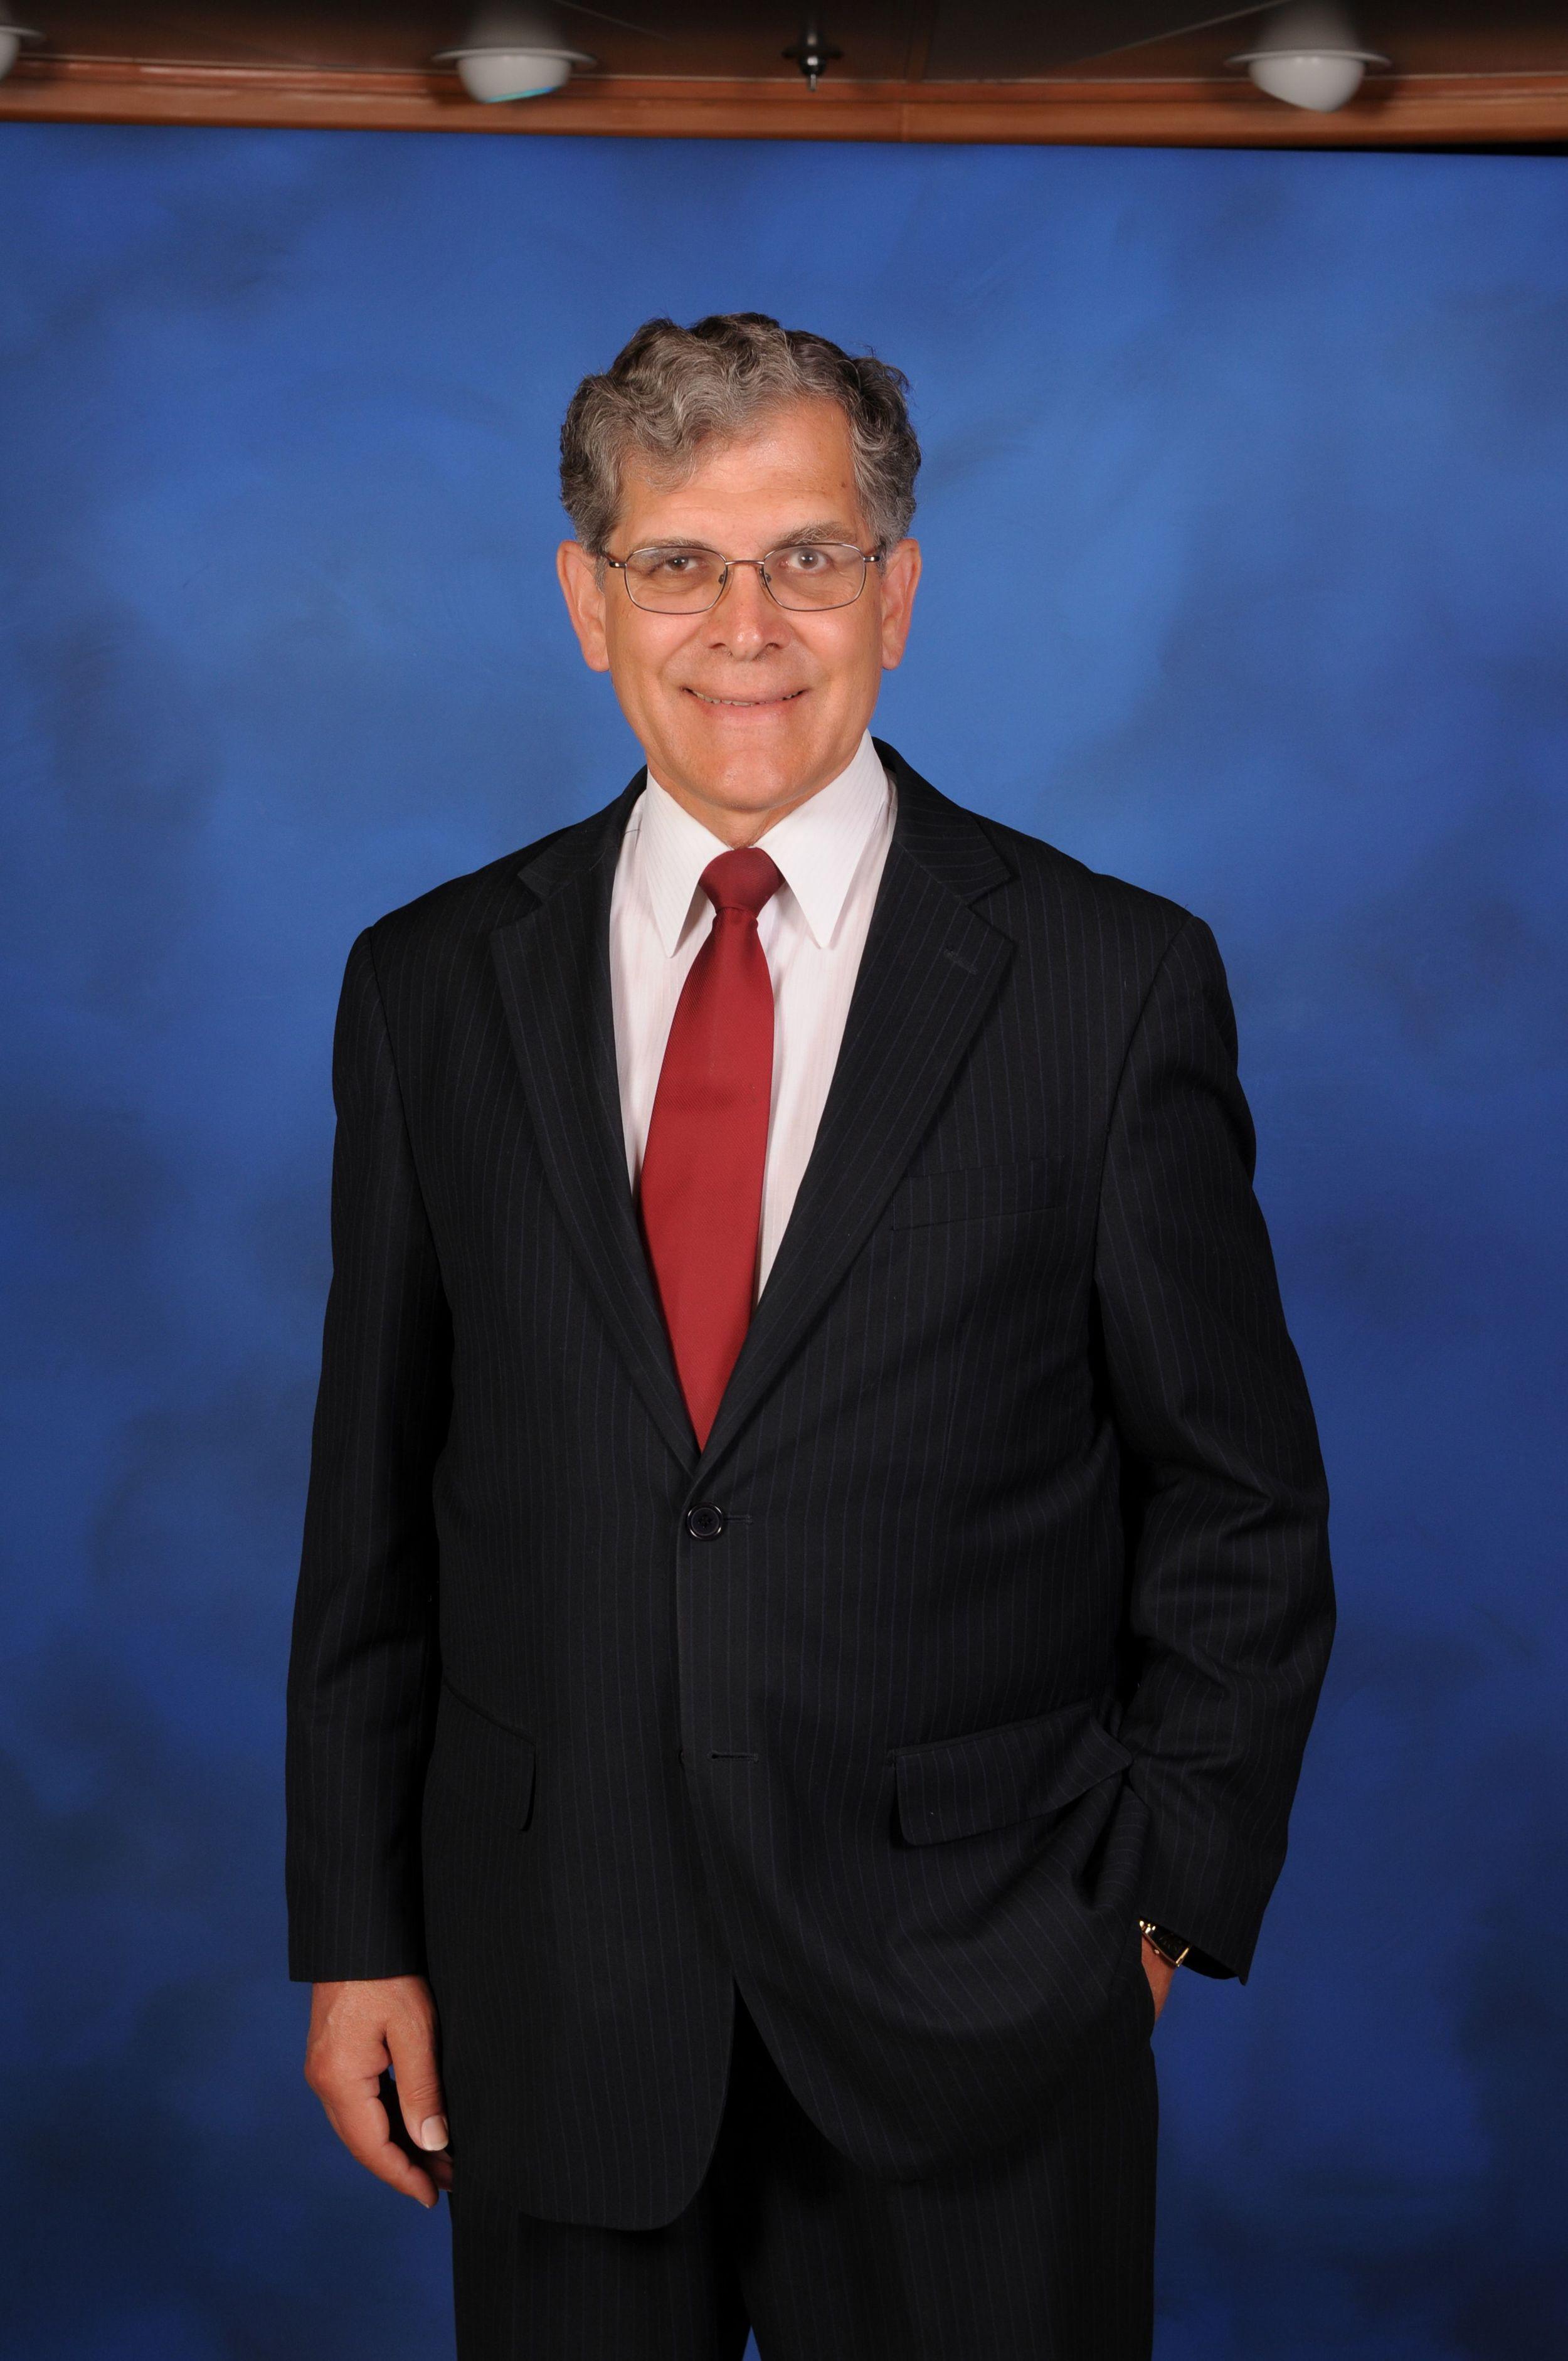 Michael C. Gray